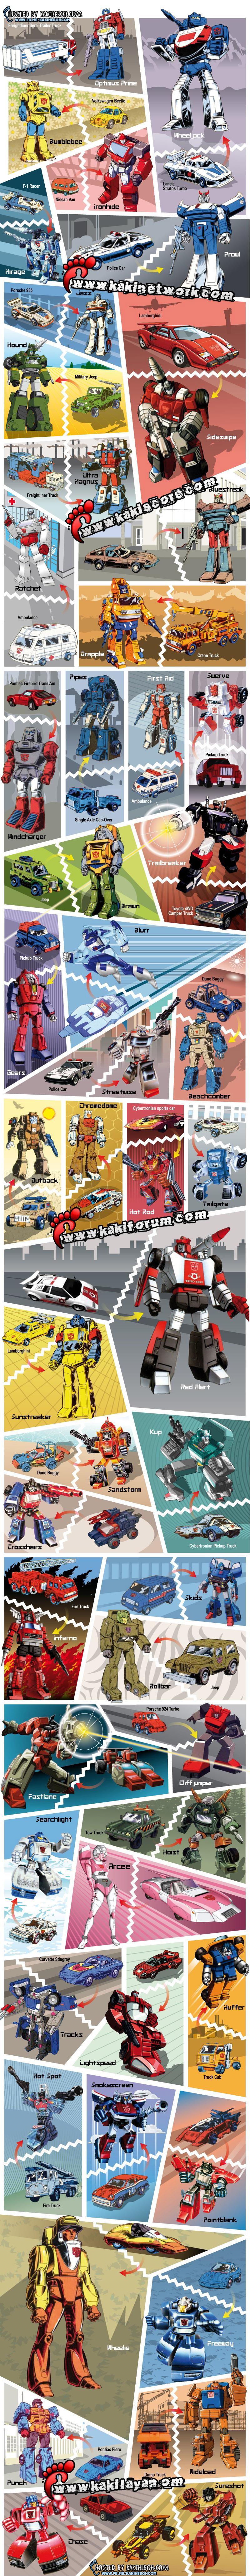 TransformersAutobot_page